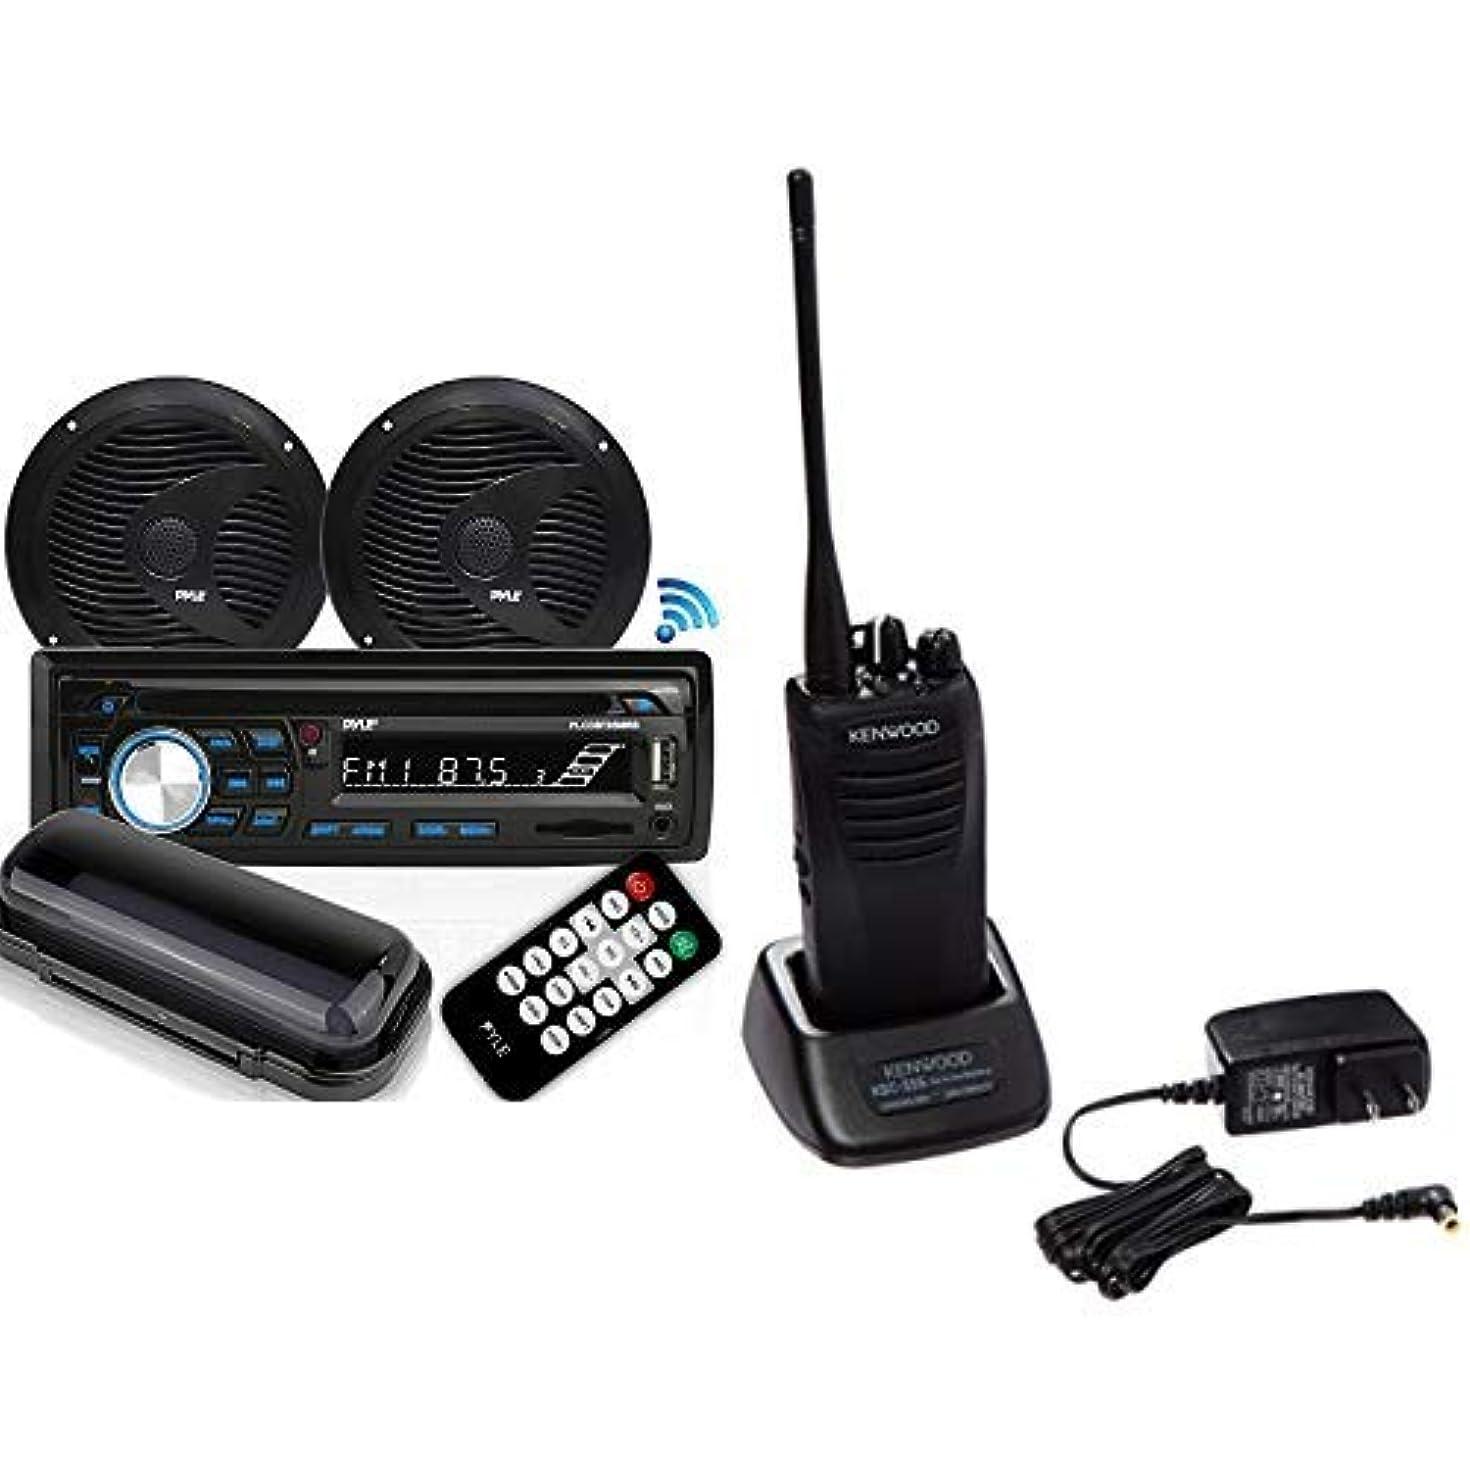 "Marine Stereo Receiver Speaker Kit & Microphone 6.5"" Waterproof Speakers (2) and TK-3400U16P ProTalk 16 Channel Compact UHF FM 2-Watts Portable Two-Way Radio"